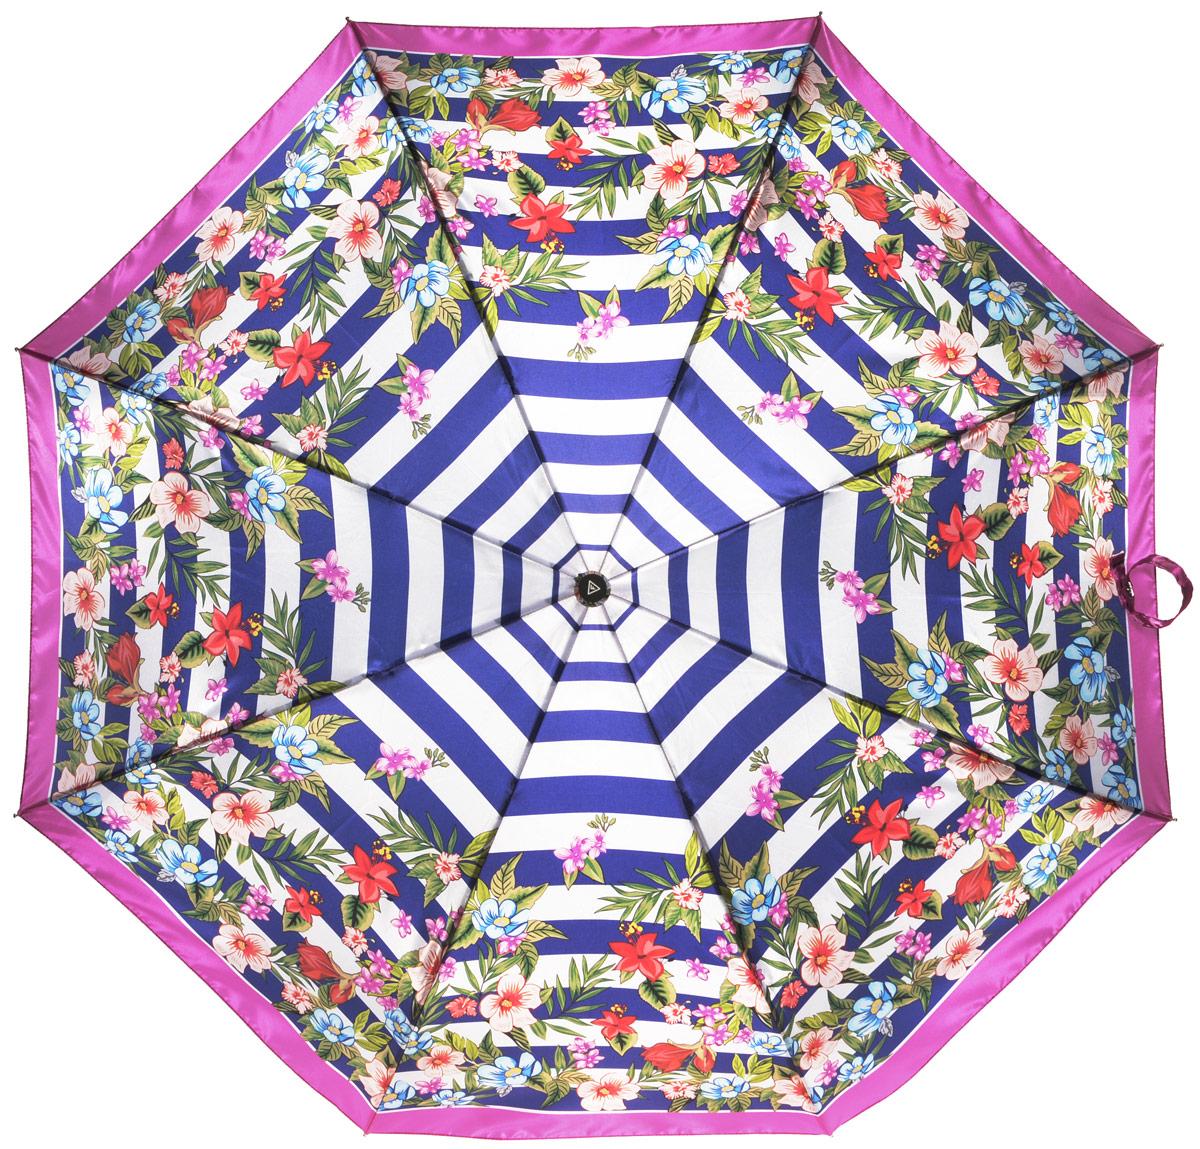 Зонт женский Fabretti, автомат, 3 сложения, цвет: мультиколор. L-16105-8L-16105-8Зонт женский Fabretti, облегченный суперавтомат, 3 сложения